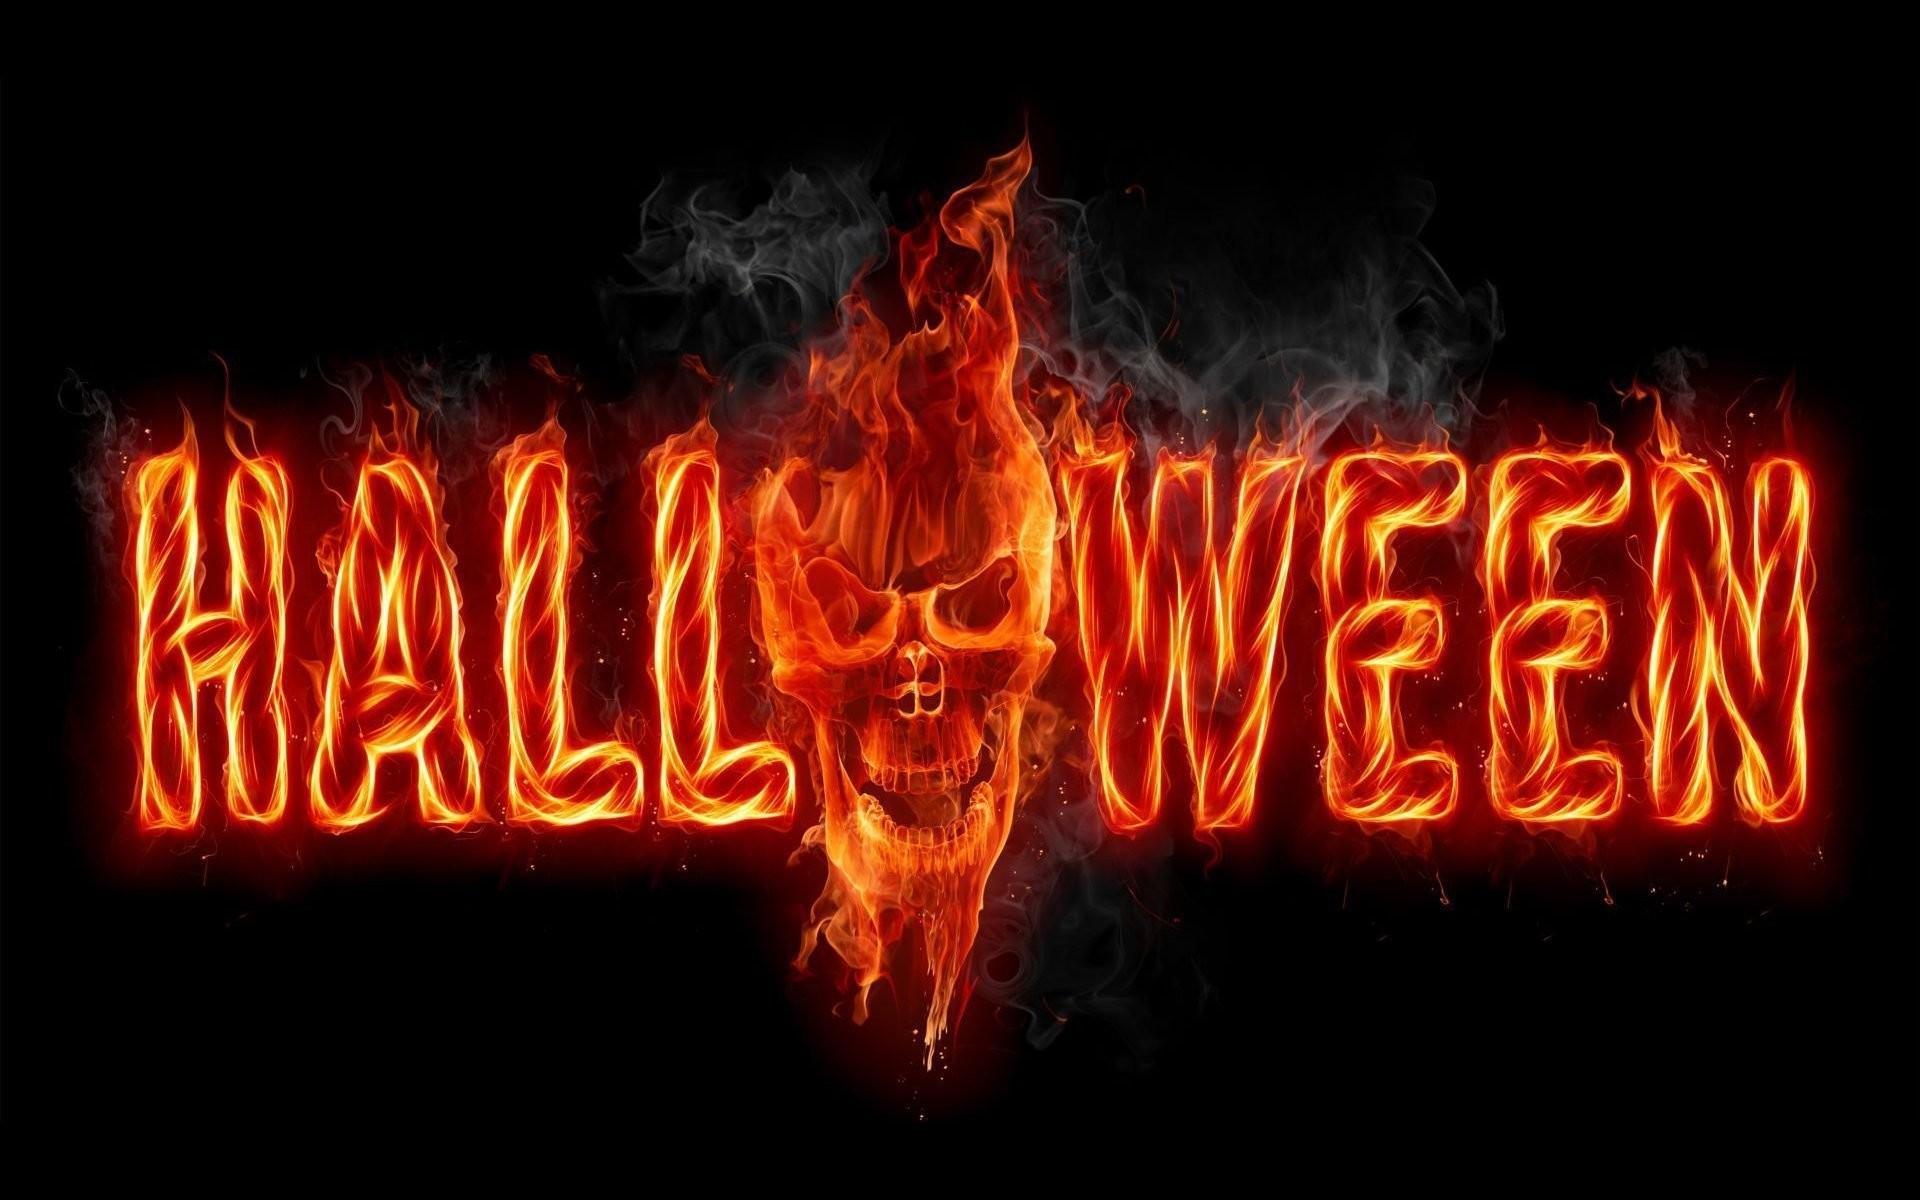 Animated Skull Wallpaper Skull Fire Wallpaper 61 Images